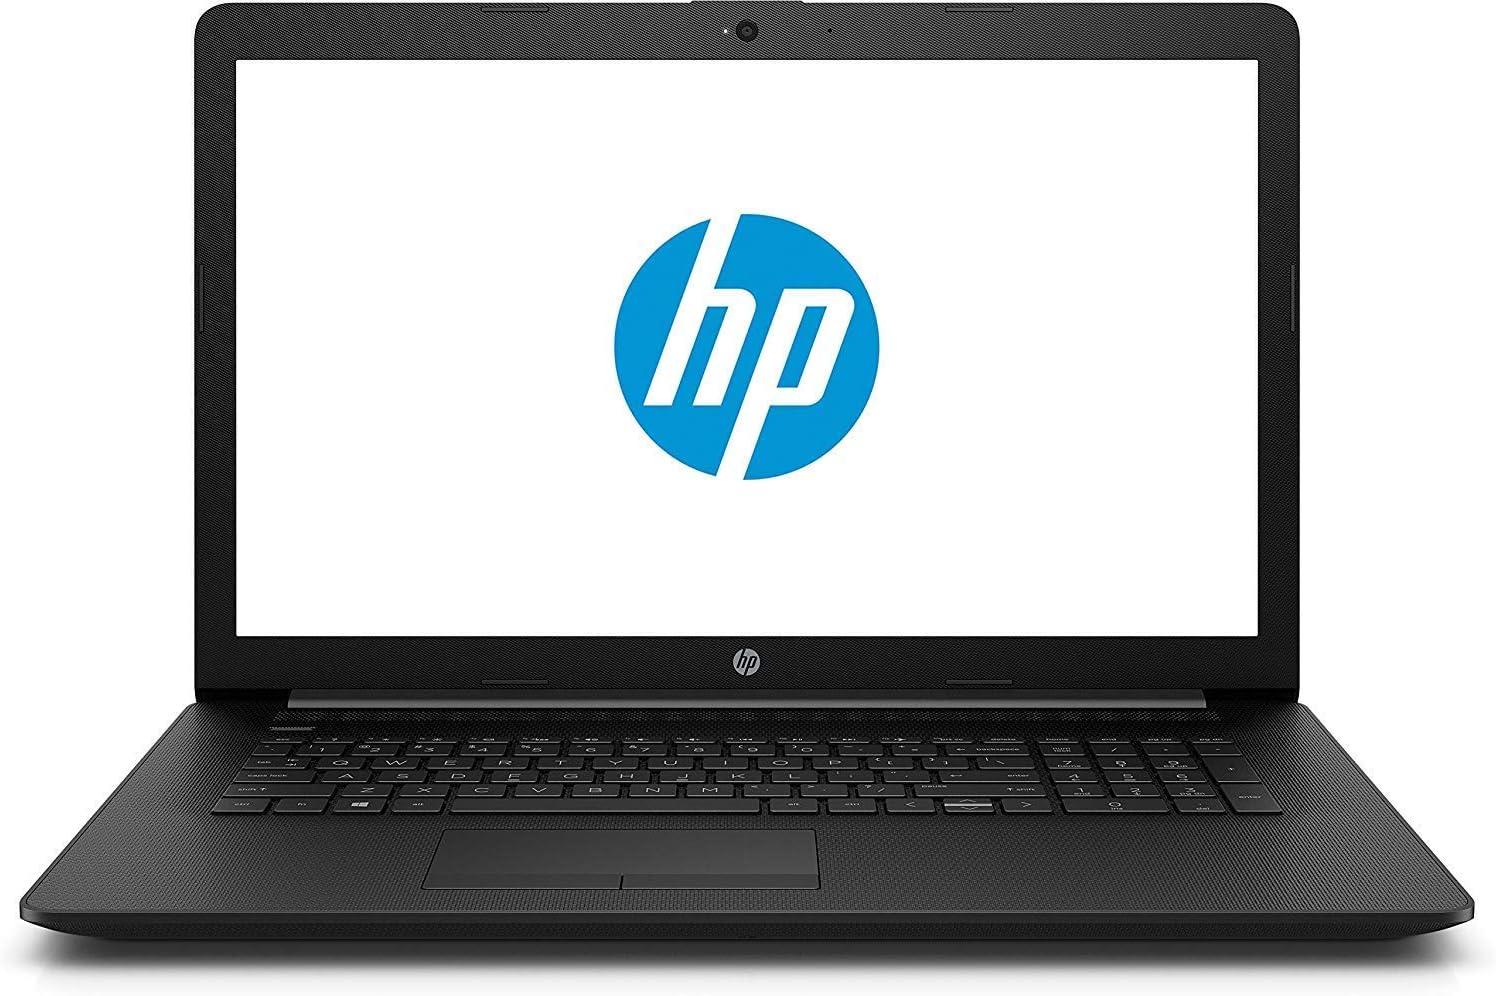 "HP High performance 17.3"" HD+ WLED-backlit Laptop, 7th Gen Intel i5-7200U 2.5G Hz Processor, 12GB DDR4, 1TB HDD,DVD Burner, WiFi, Webcam, HDMI, USB 3.1, Intel HD Graphics 620, DTS Sound, Windows 10"